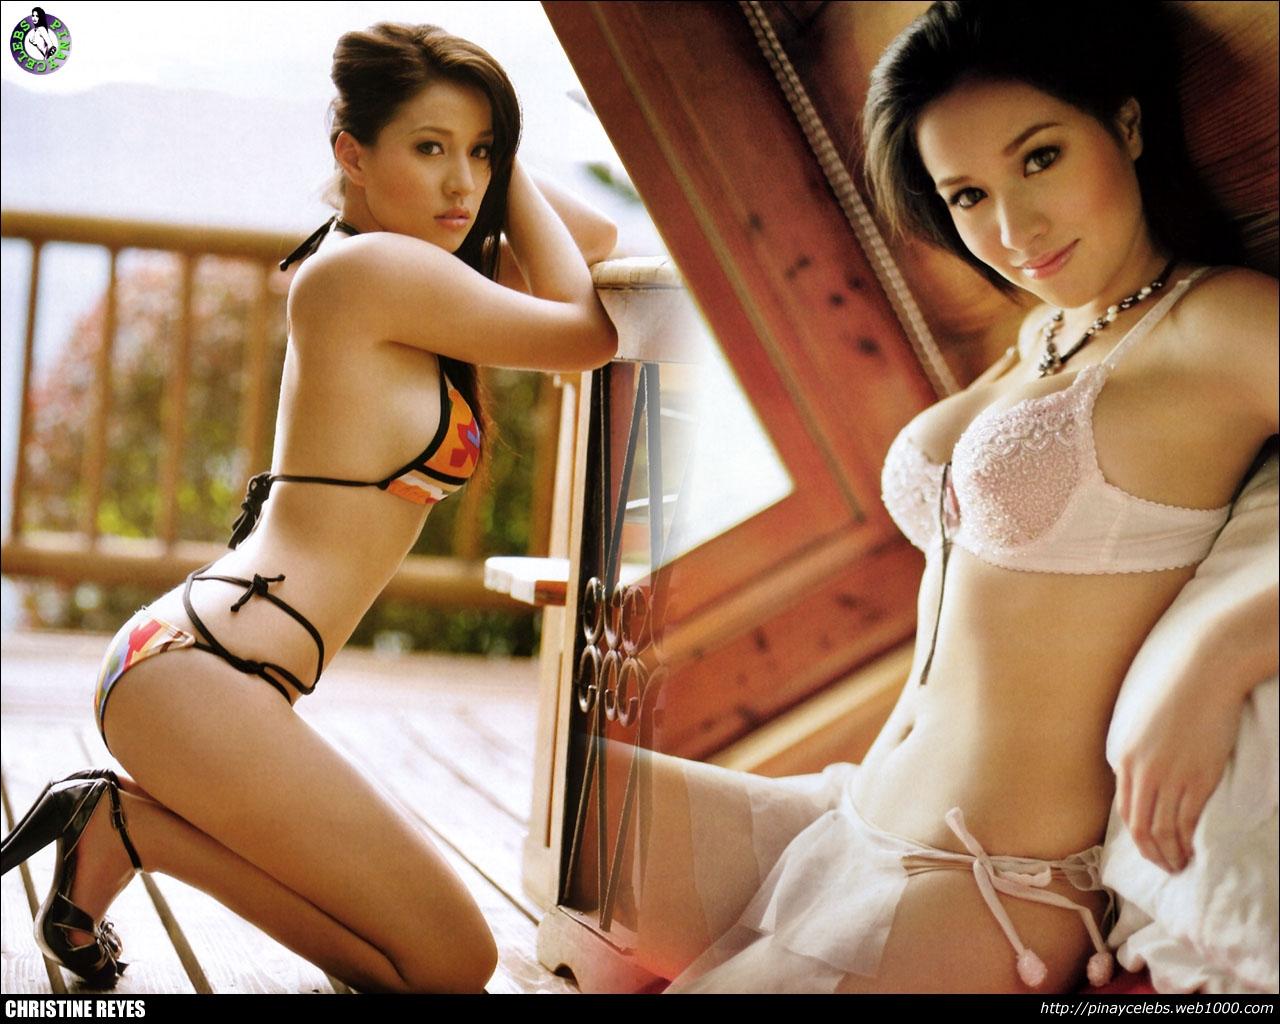 Another Cristine Reyes in Bikini Photos